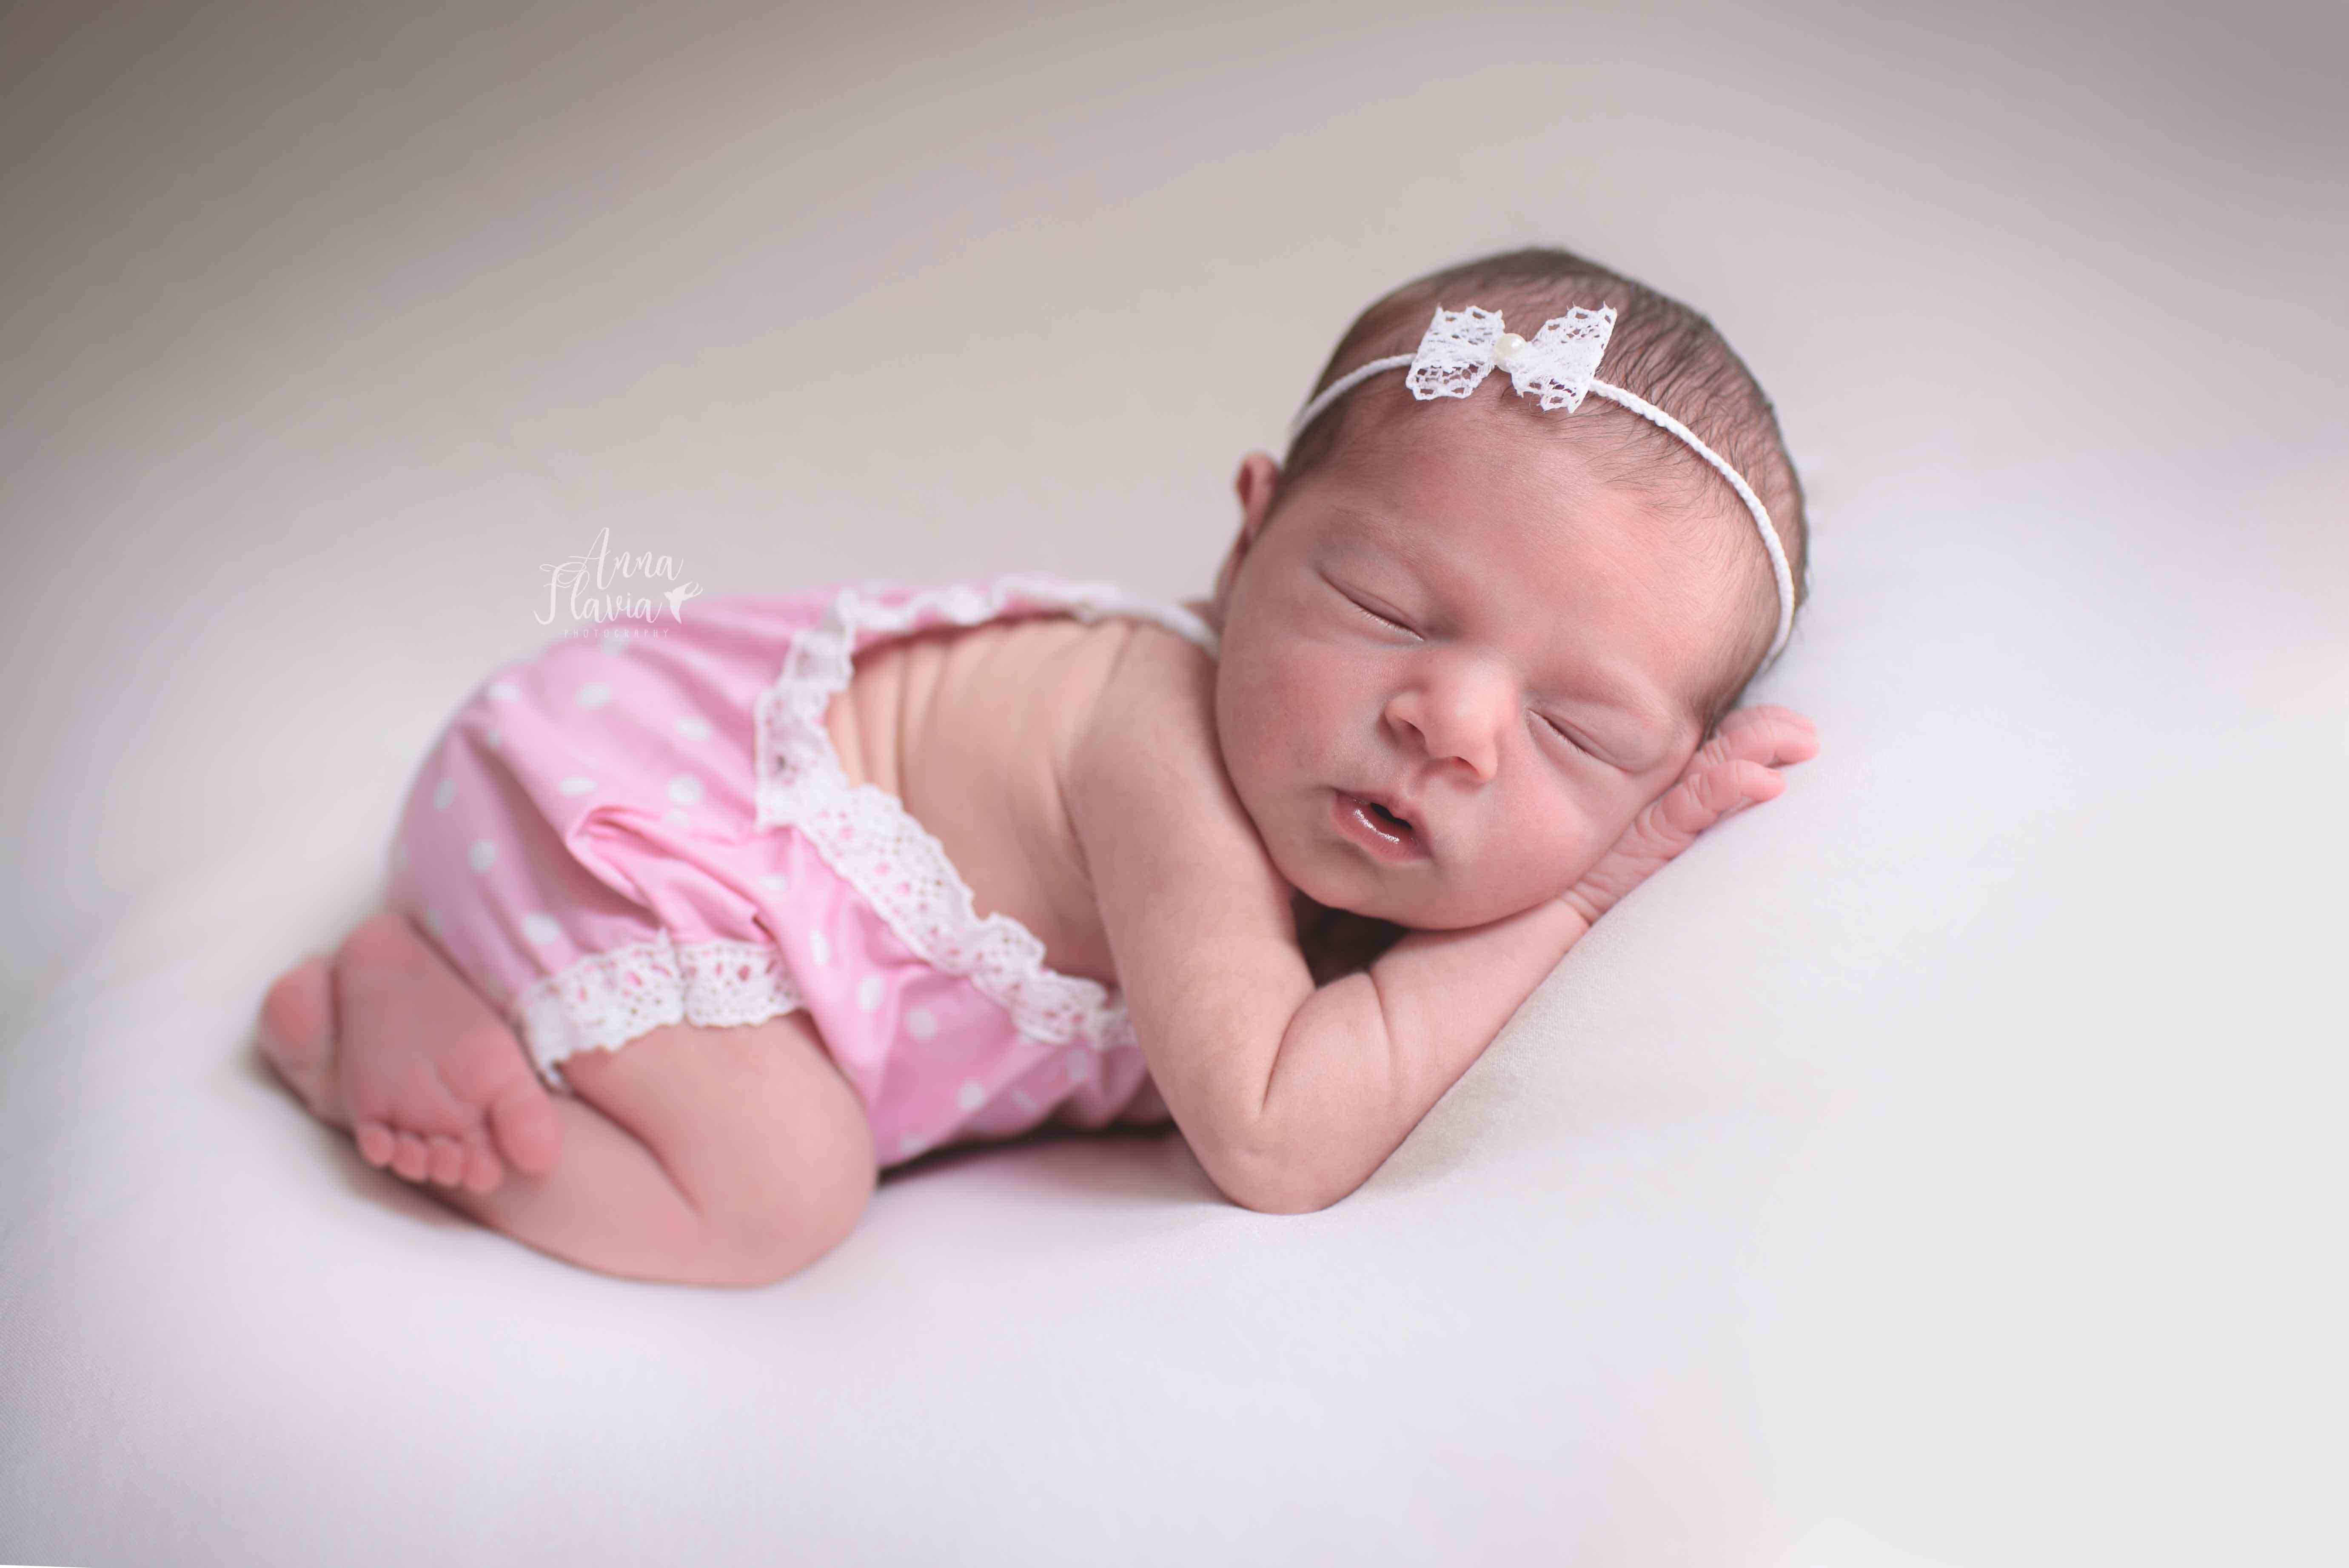 photographer_dublin_anna_flavia_newborn_maternity_14